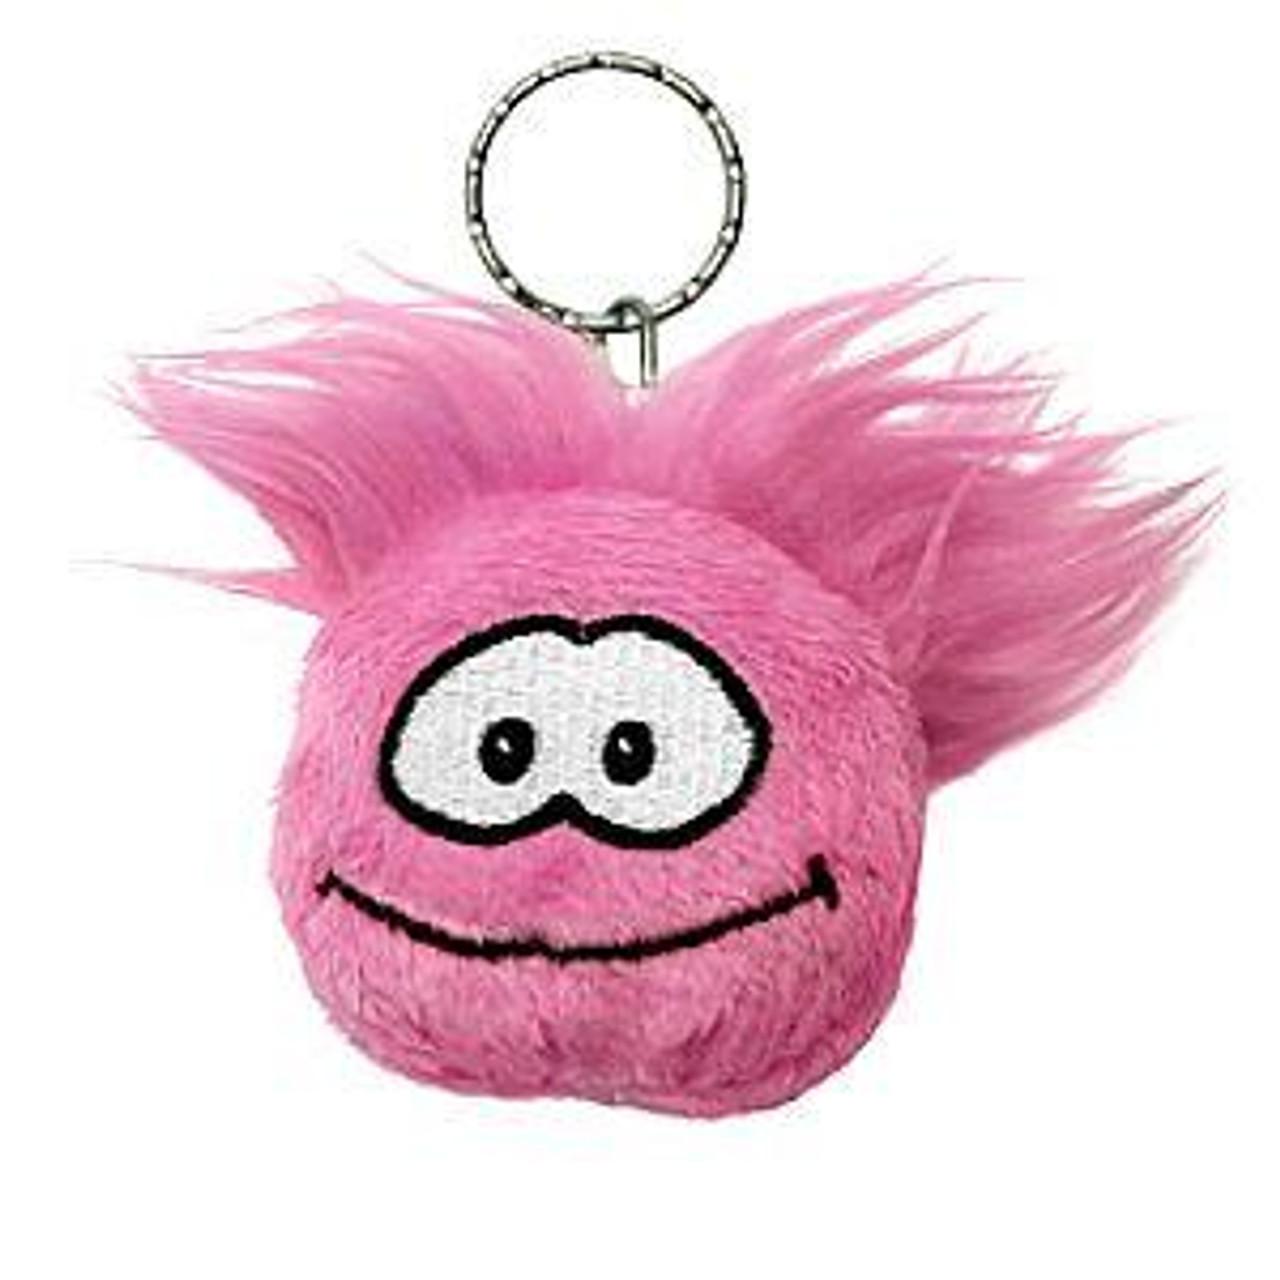 Club Penguin Pink Puffle 2-Inch Plush Keychain